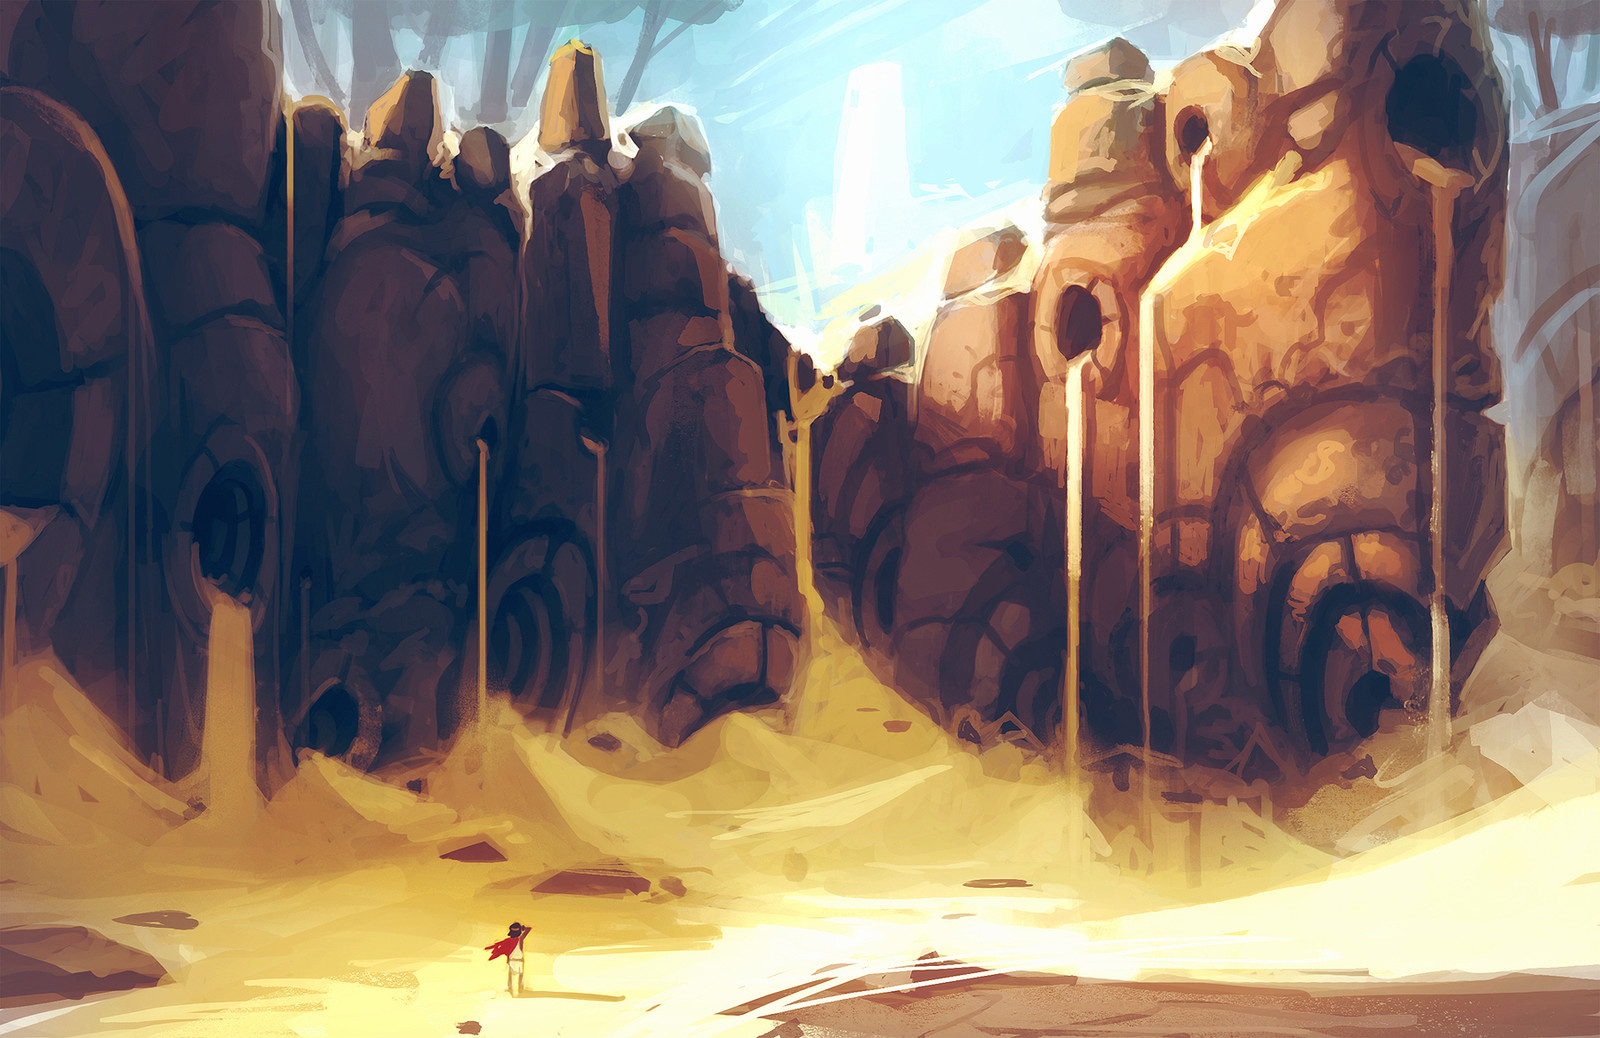 Sand Waterfalls